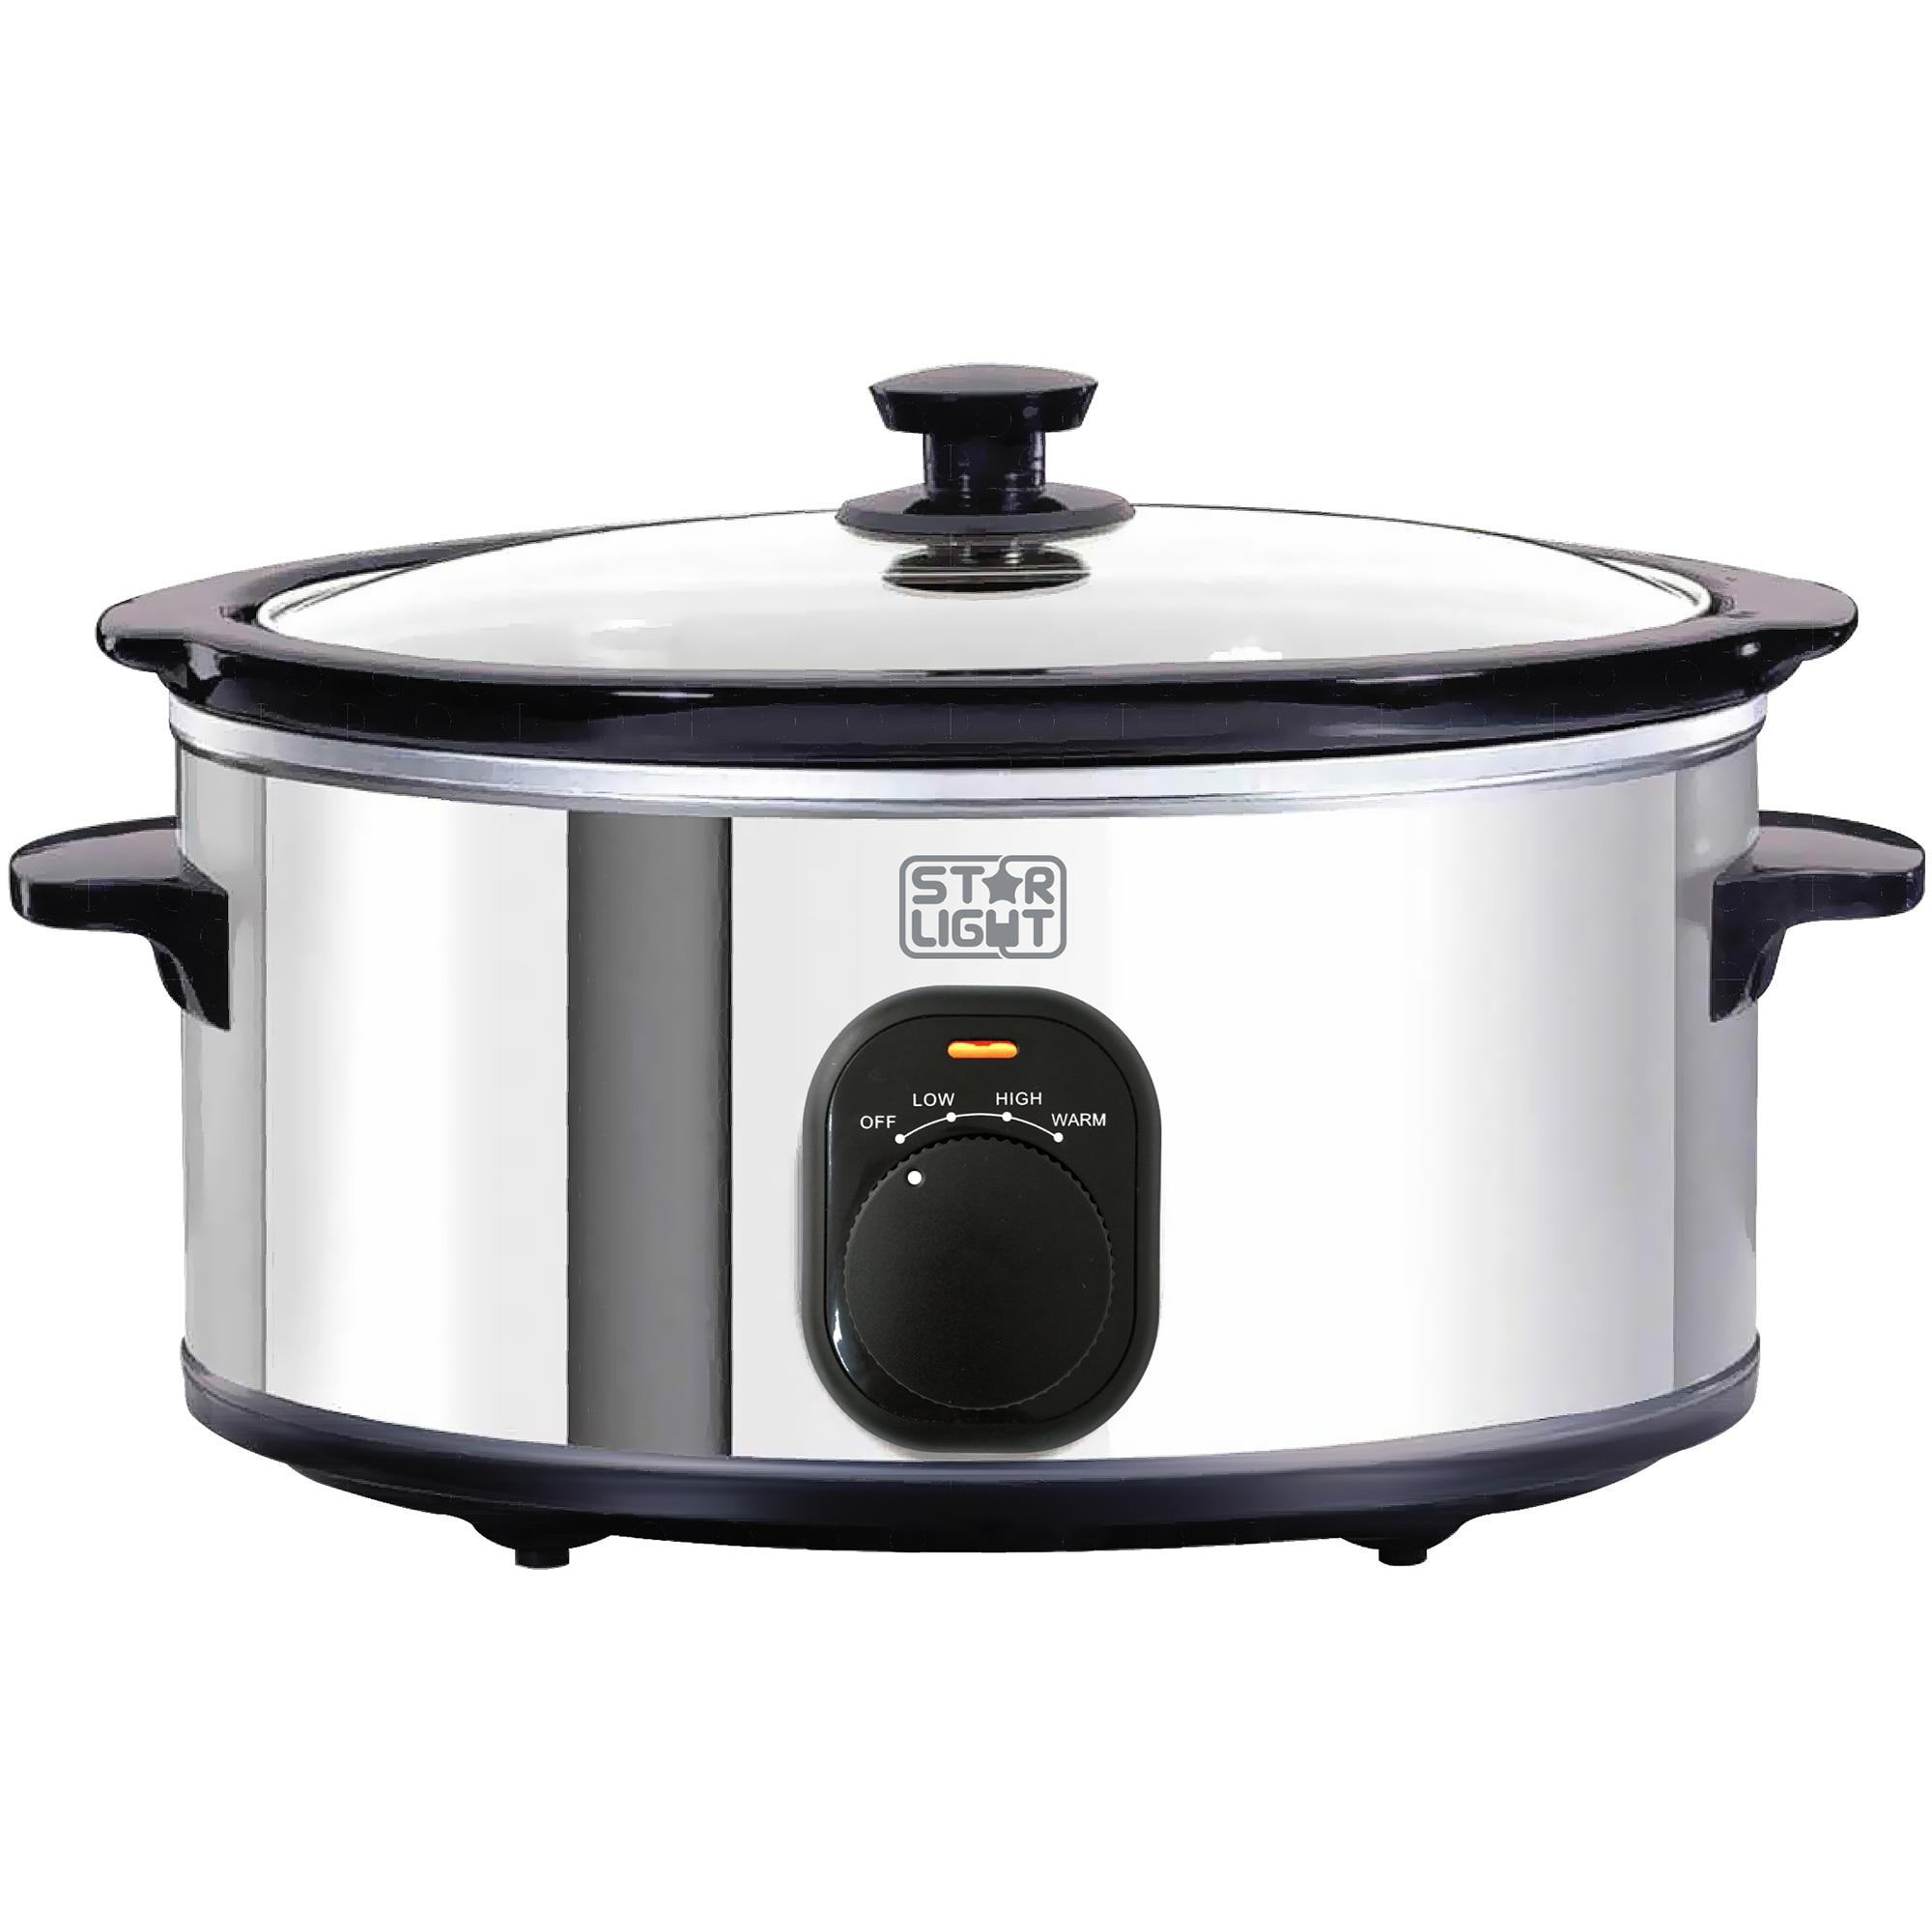 Fotografie Slow cooker Star-Light SCB-524SS, 4.5l, 240W, Vas ceramica detasabil, Functie de pastrare la cald, Inox